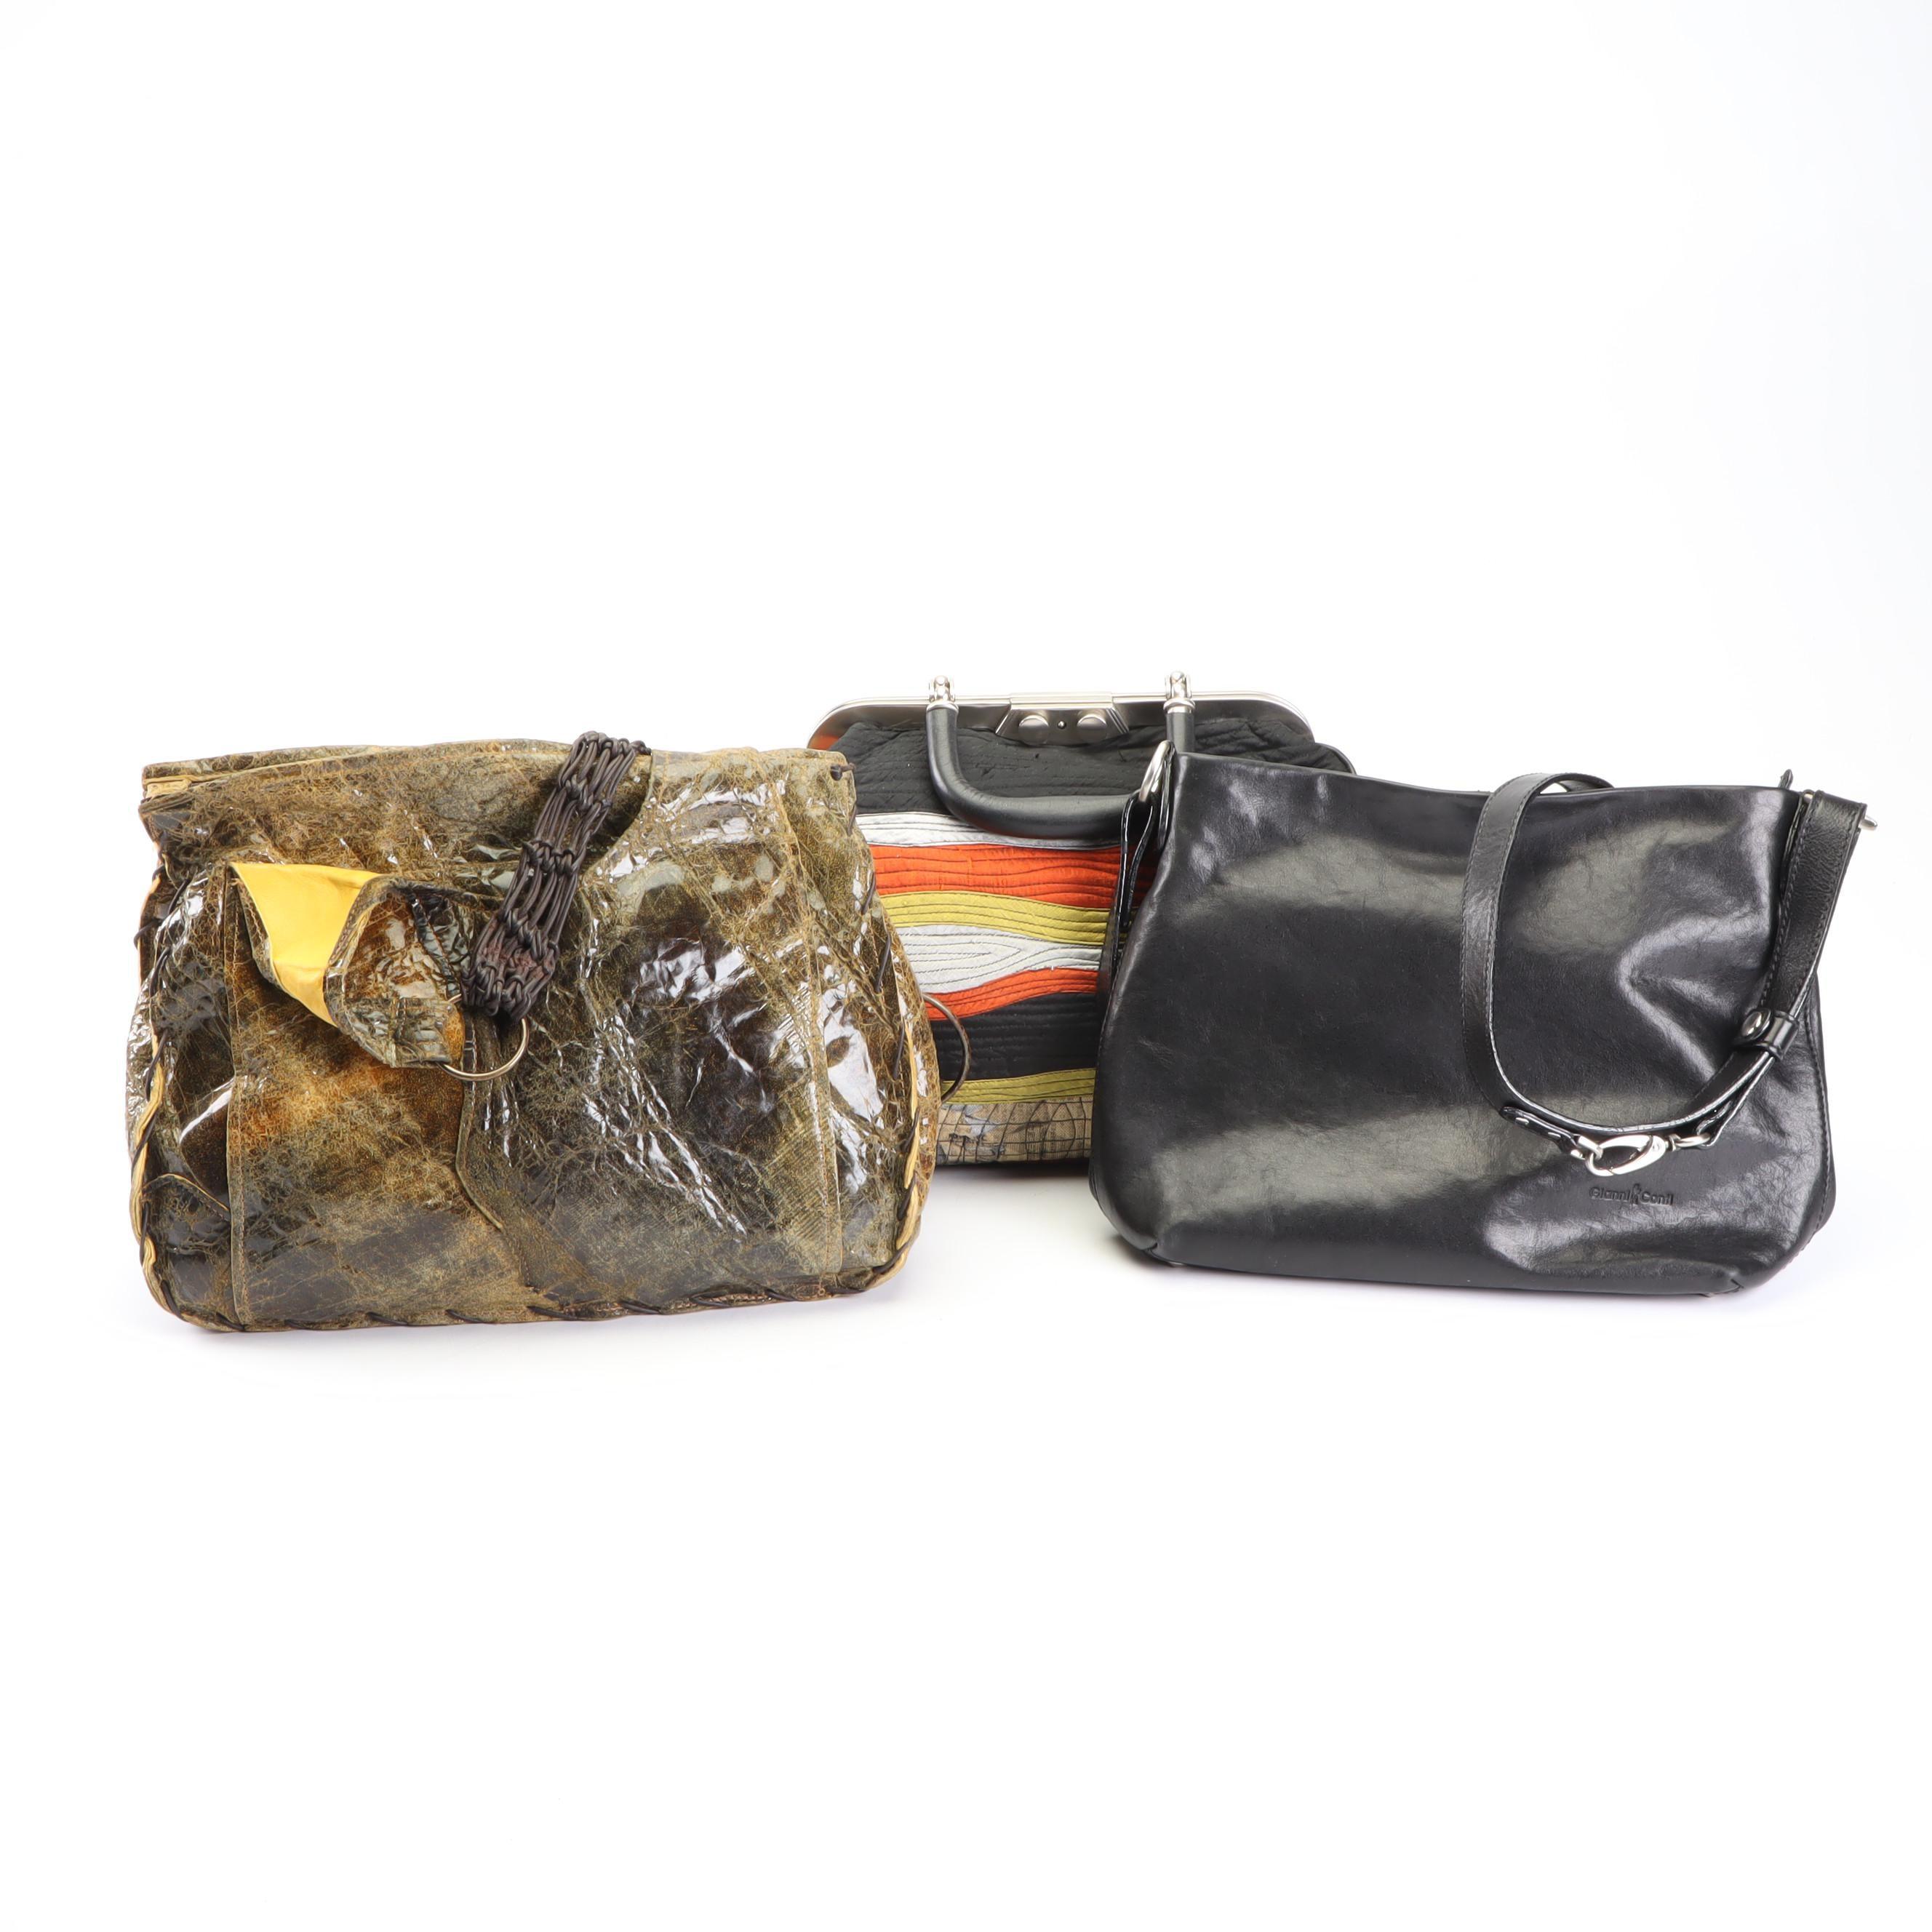 Susan Riedweg, Gianni Conti and Erman Handbags in Leather and Fabric